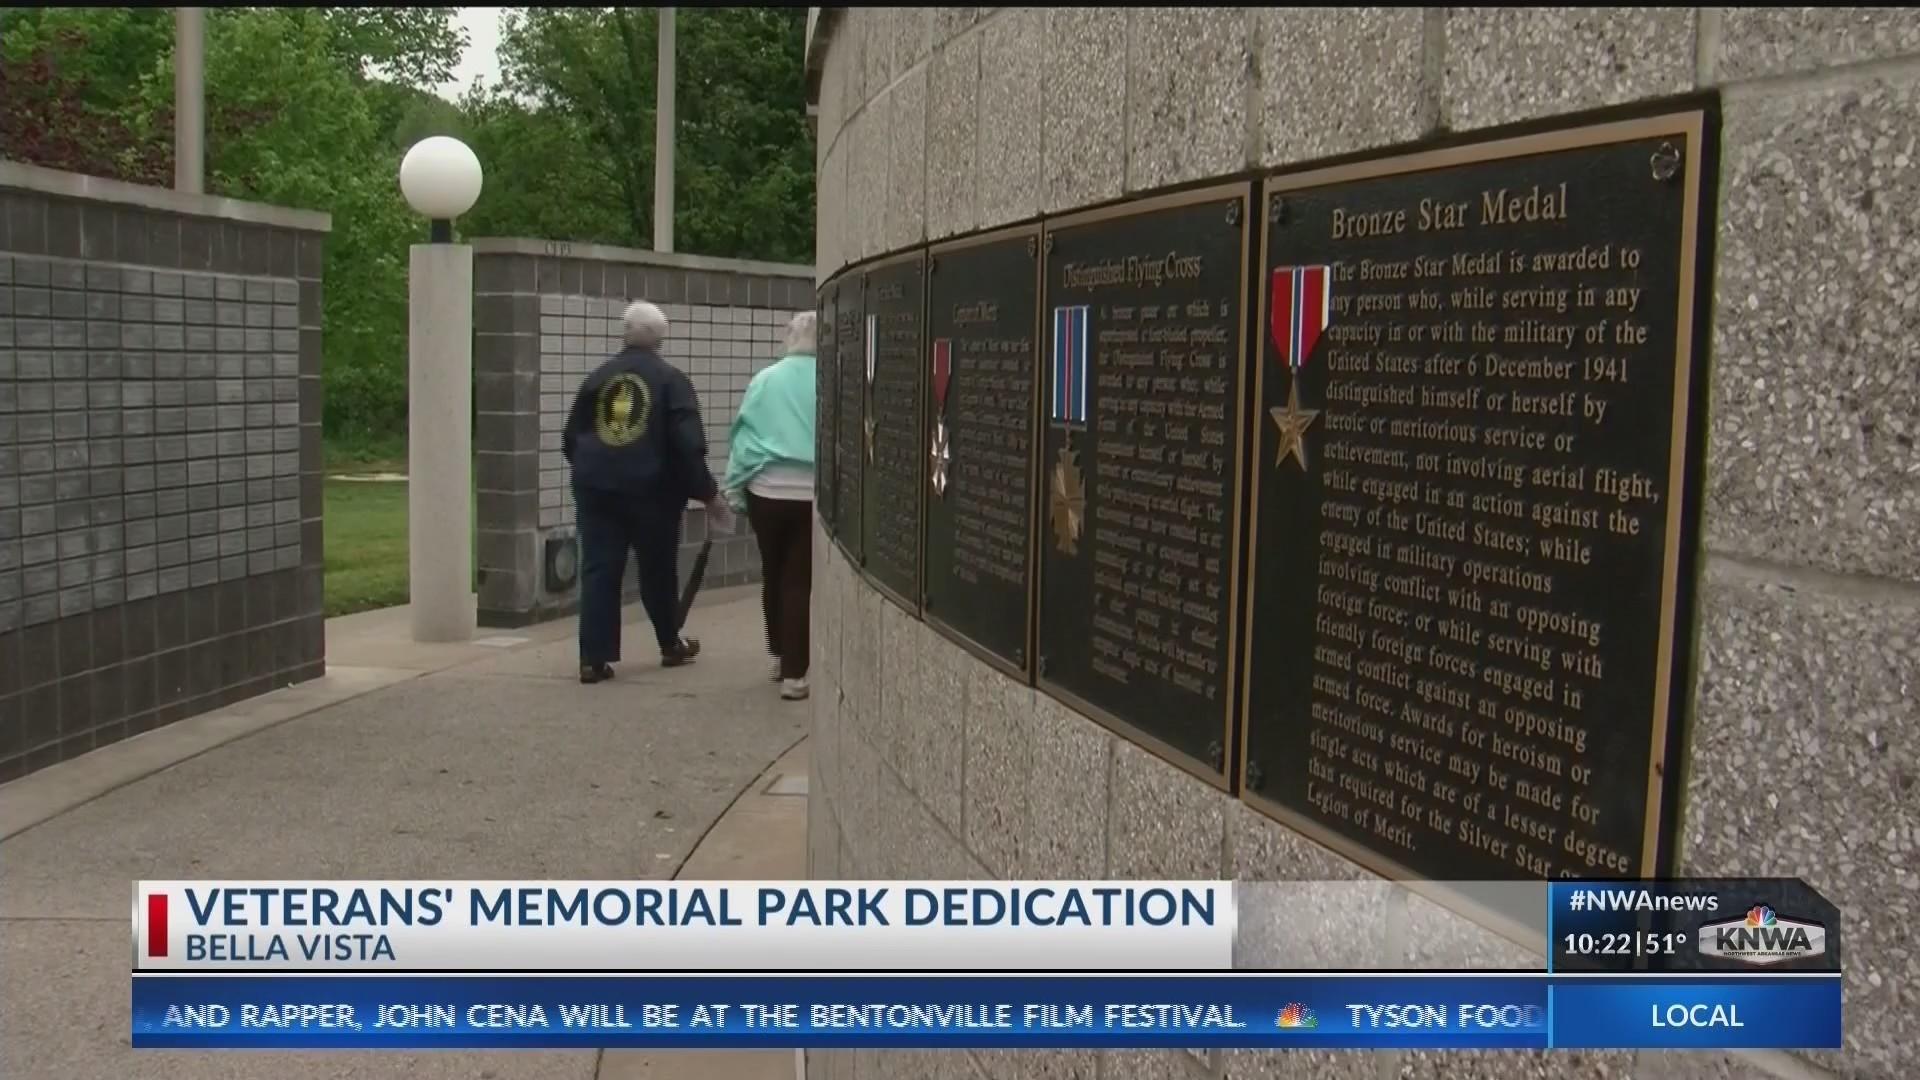 Bella_Vista_Dedicates_Veterans_Memorial__0_20190505164644